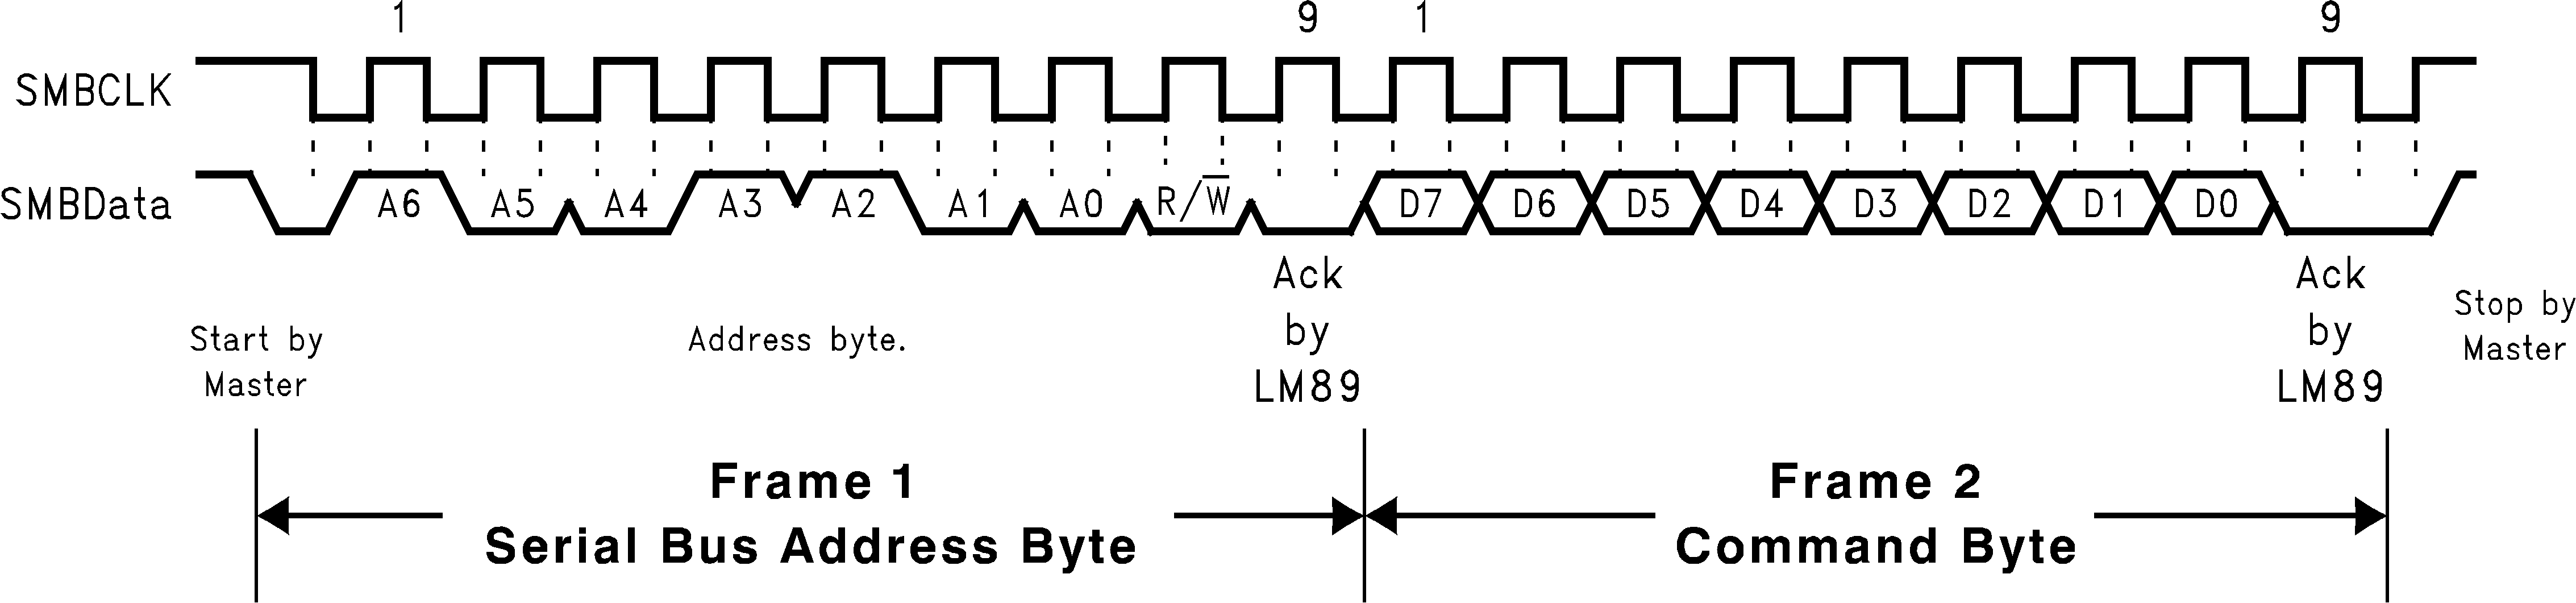 Lm89 Pentium 2 Block Diagram Timing B Serial Bus Write To The Internal Command Register